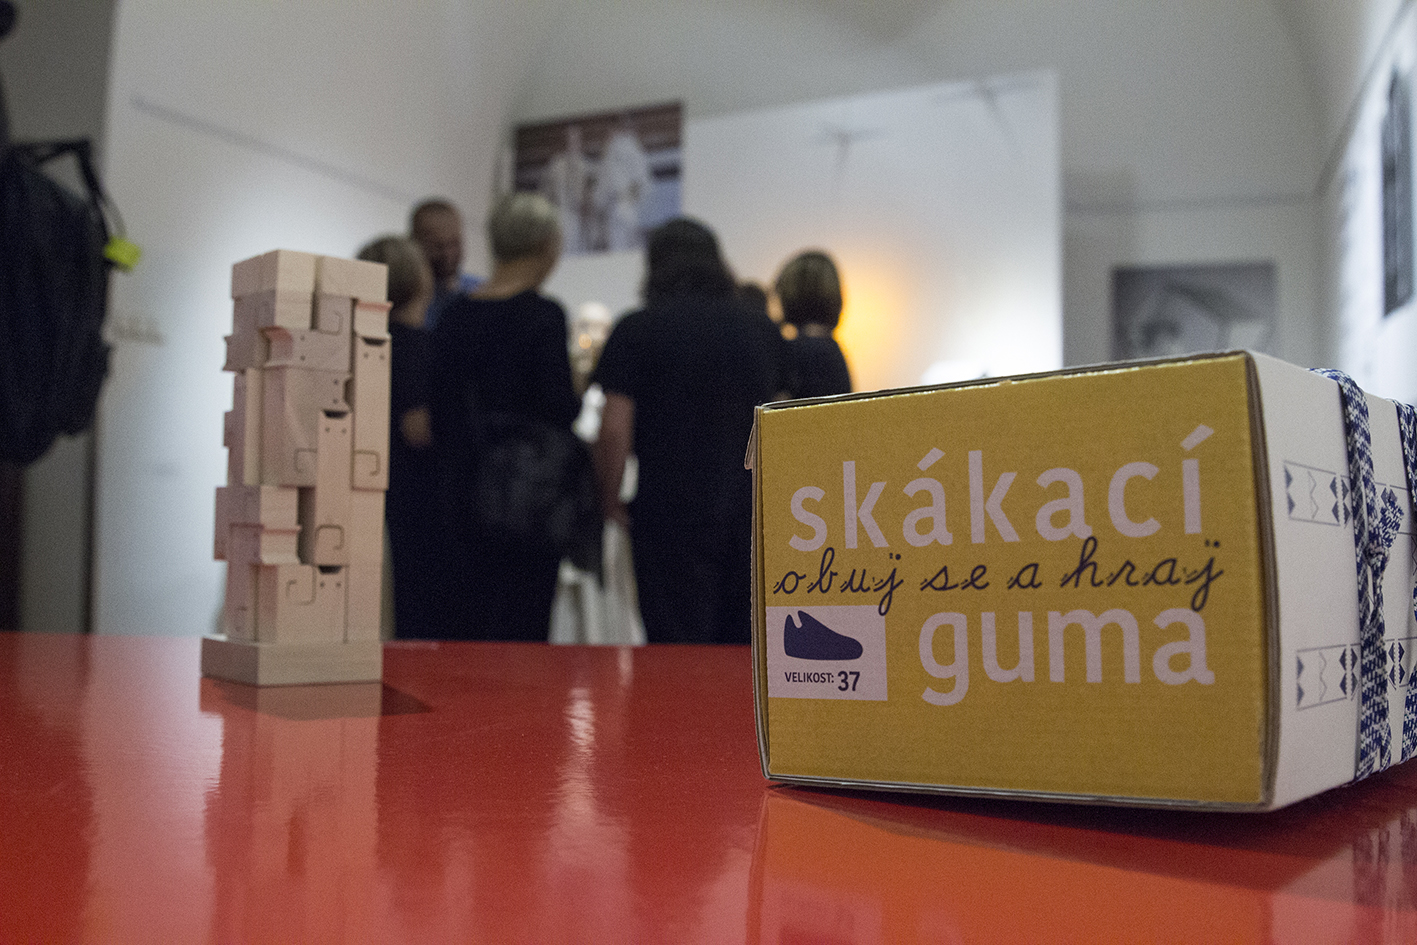 vernisáž výstavy <br> 11. 10. 2018 <br> Novoměstská radnice Praha